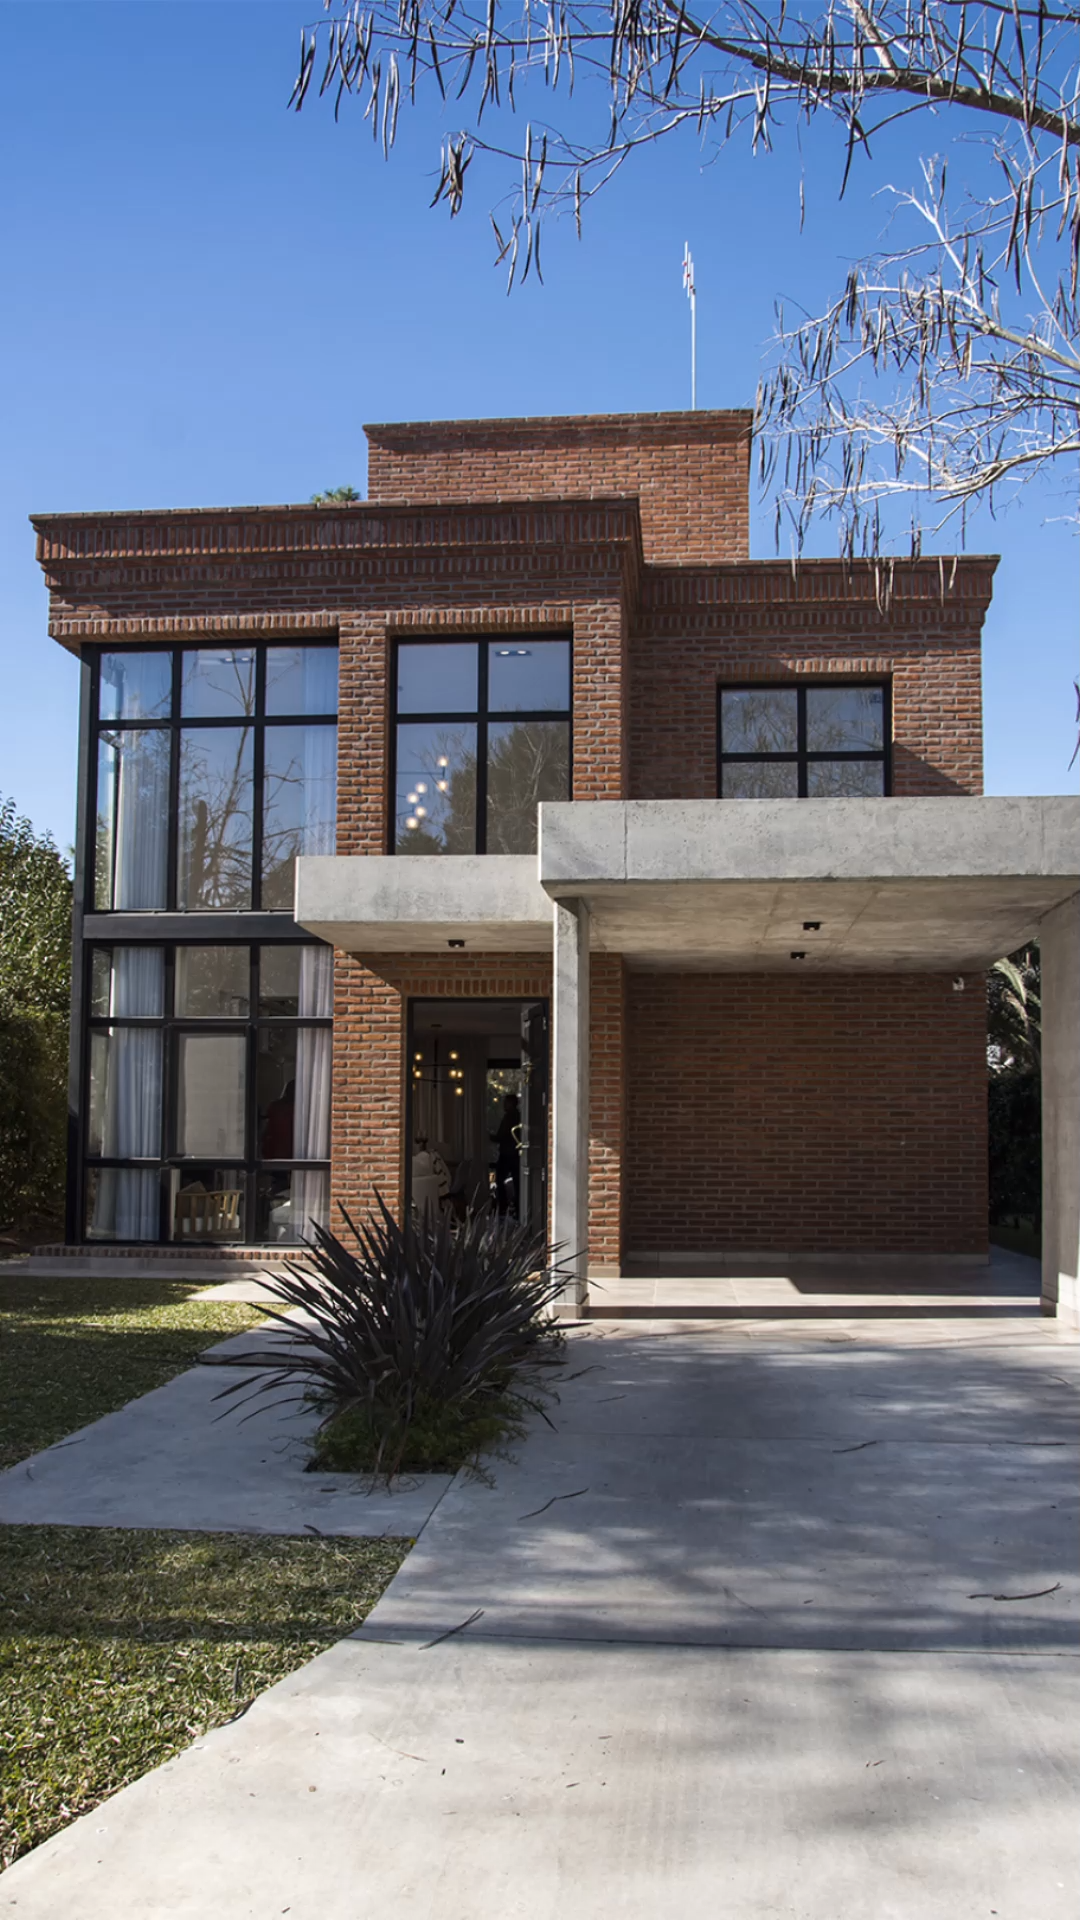 Photo of FF House of the María Laura Piccolo Arquitectura Studio